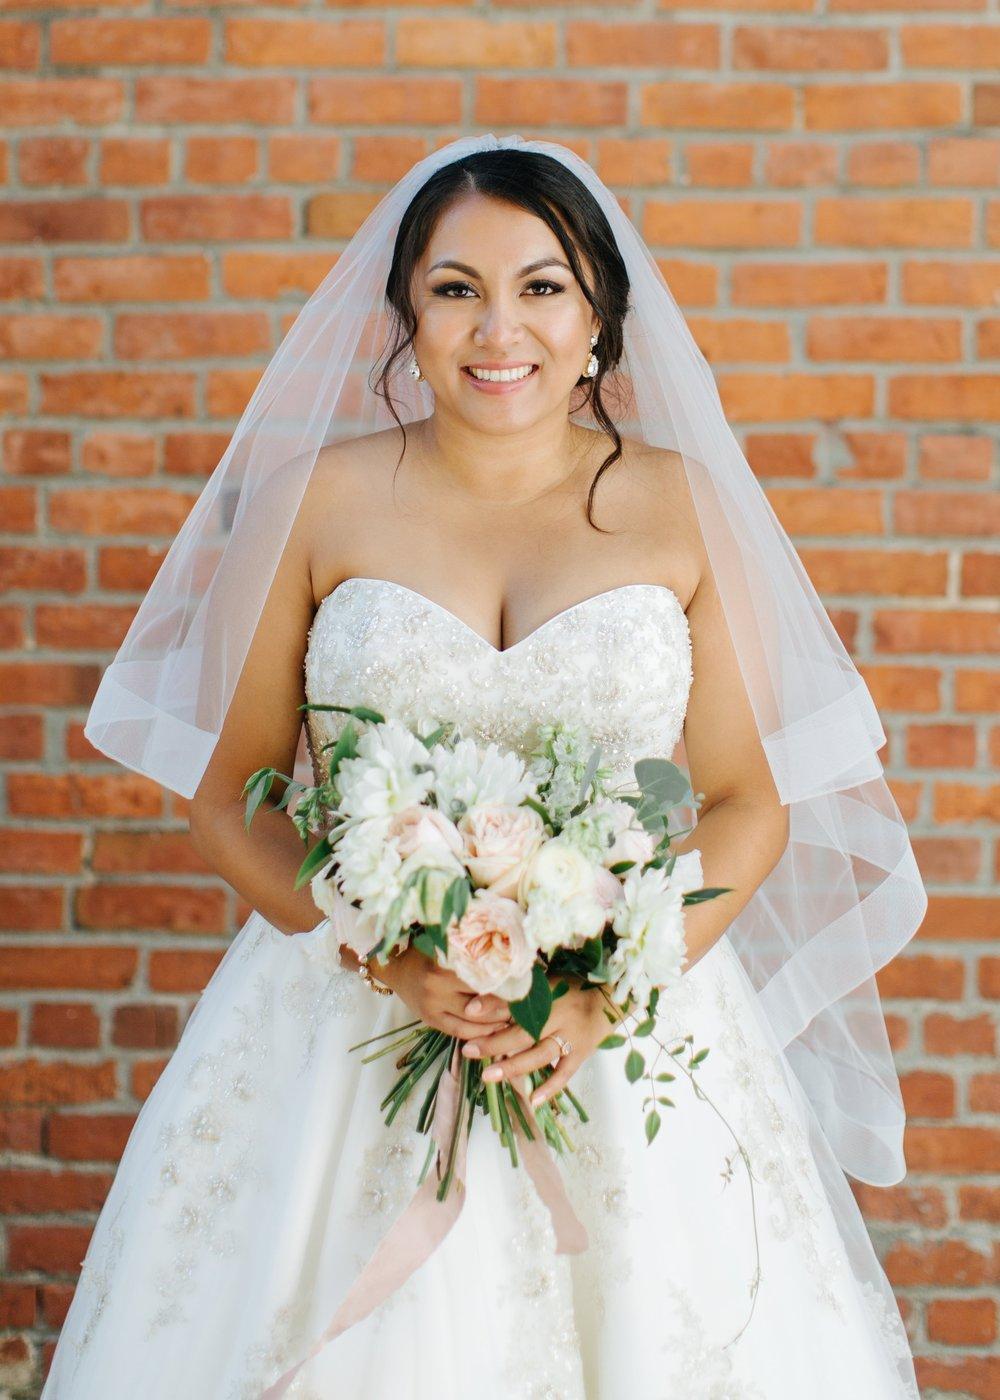 herastudios_wedding_kristina_kyle_hera_selects-62.jpg